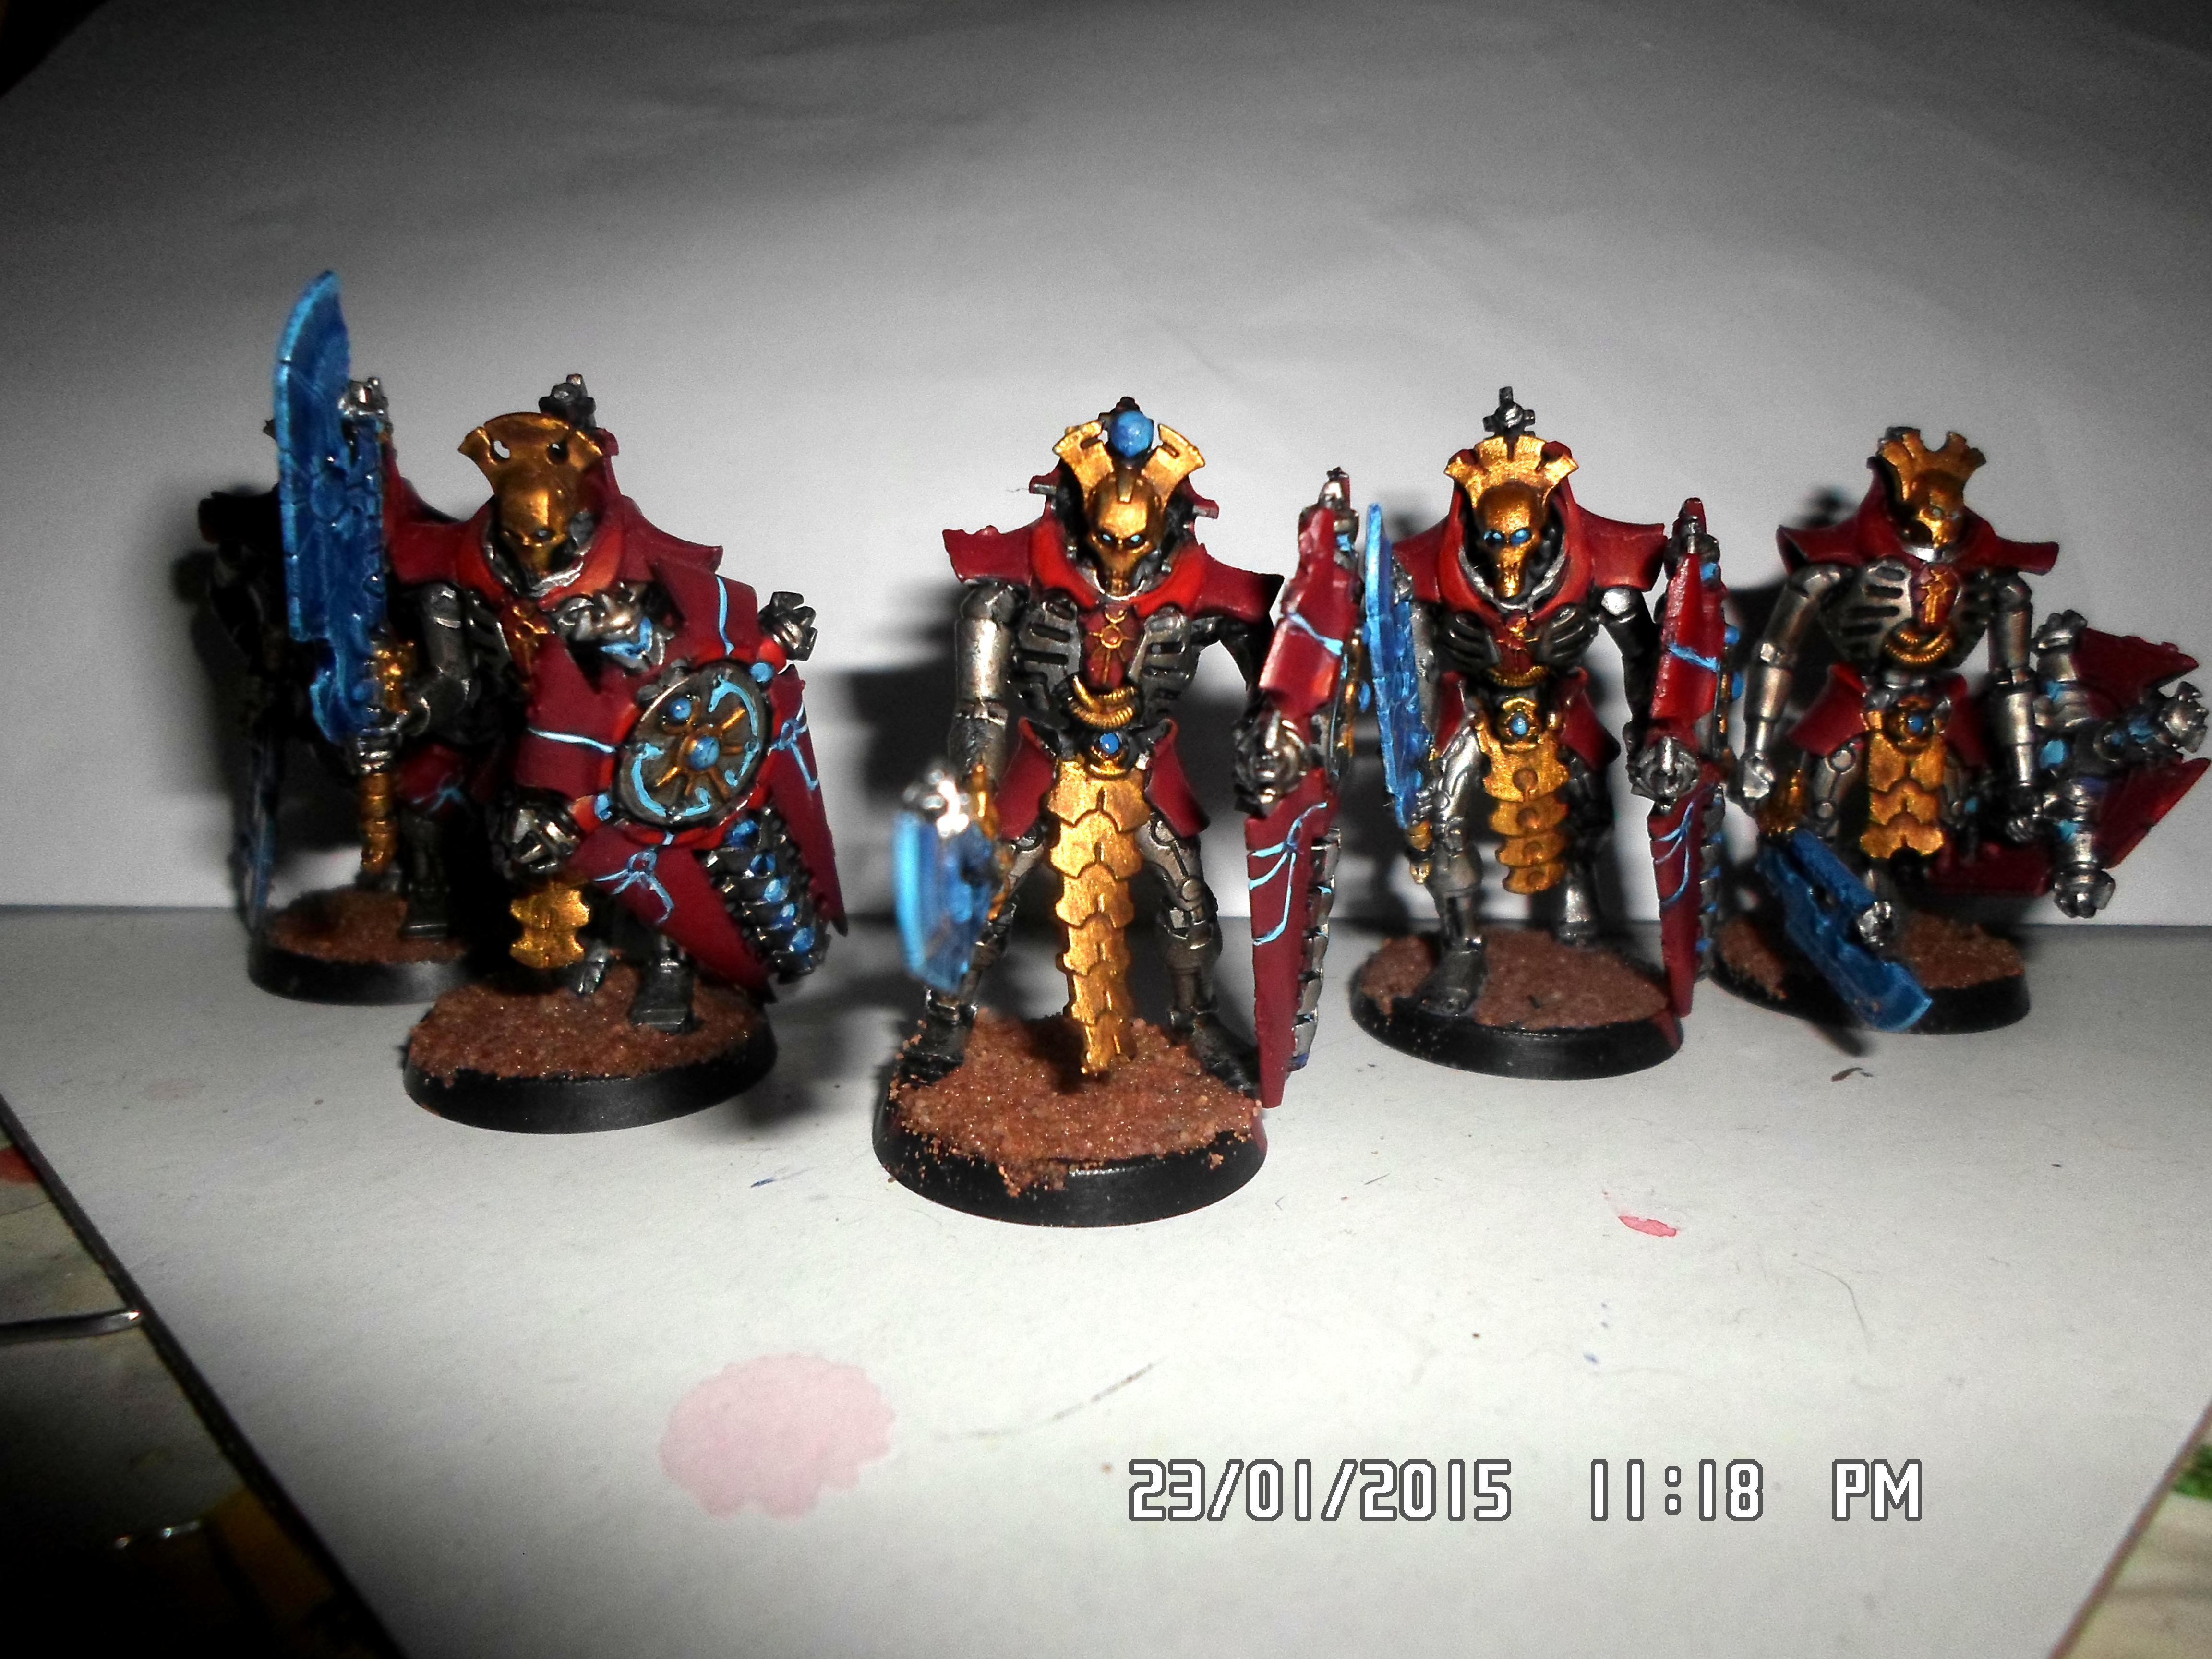 Gold, Lychguard, Necrons, Shiny